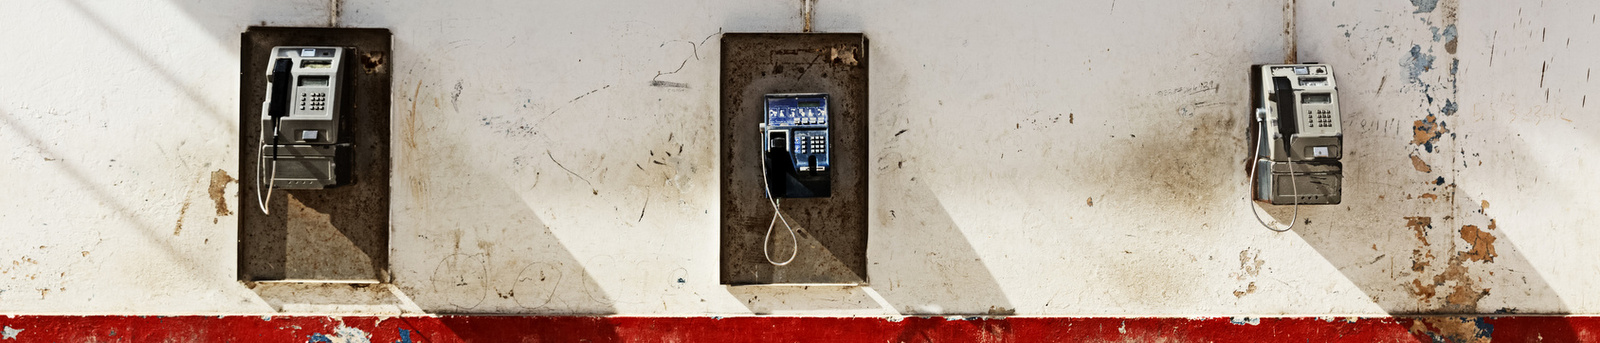 Telefone in Cuba